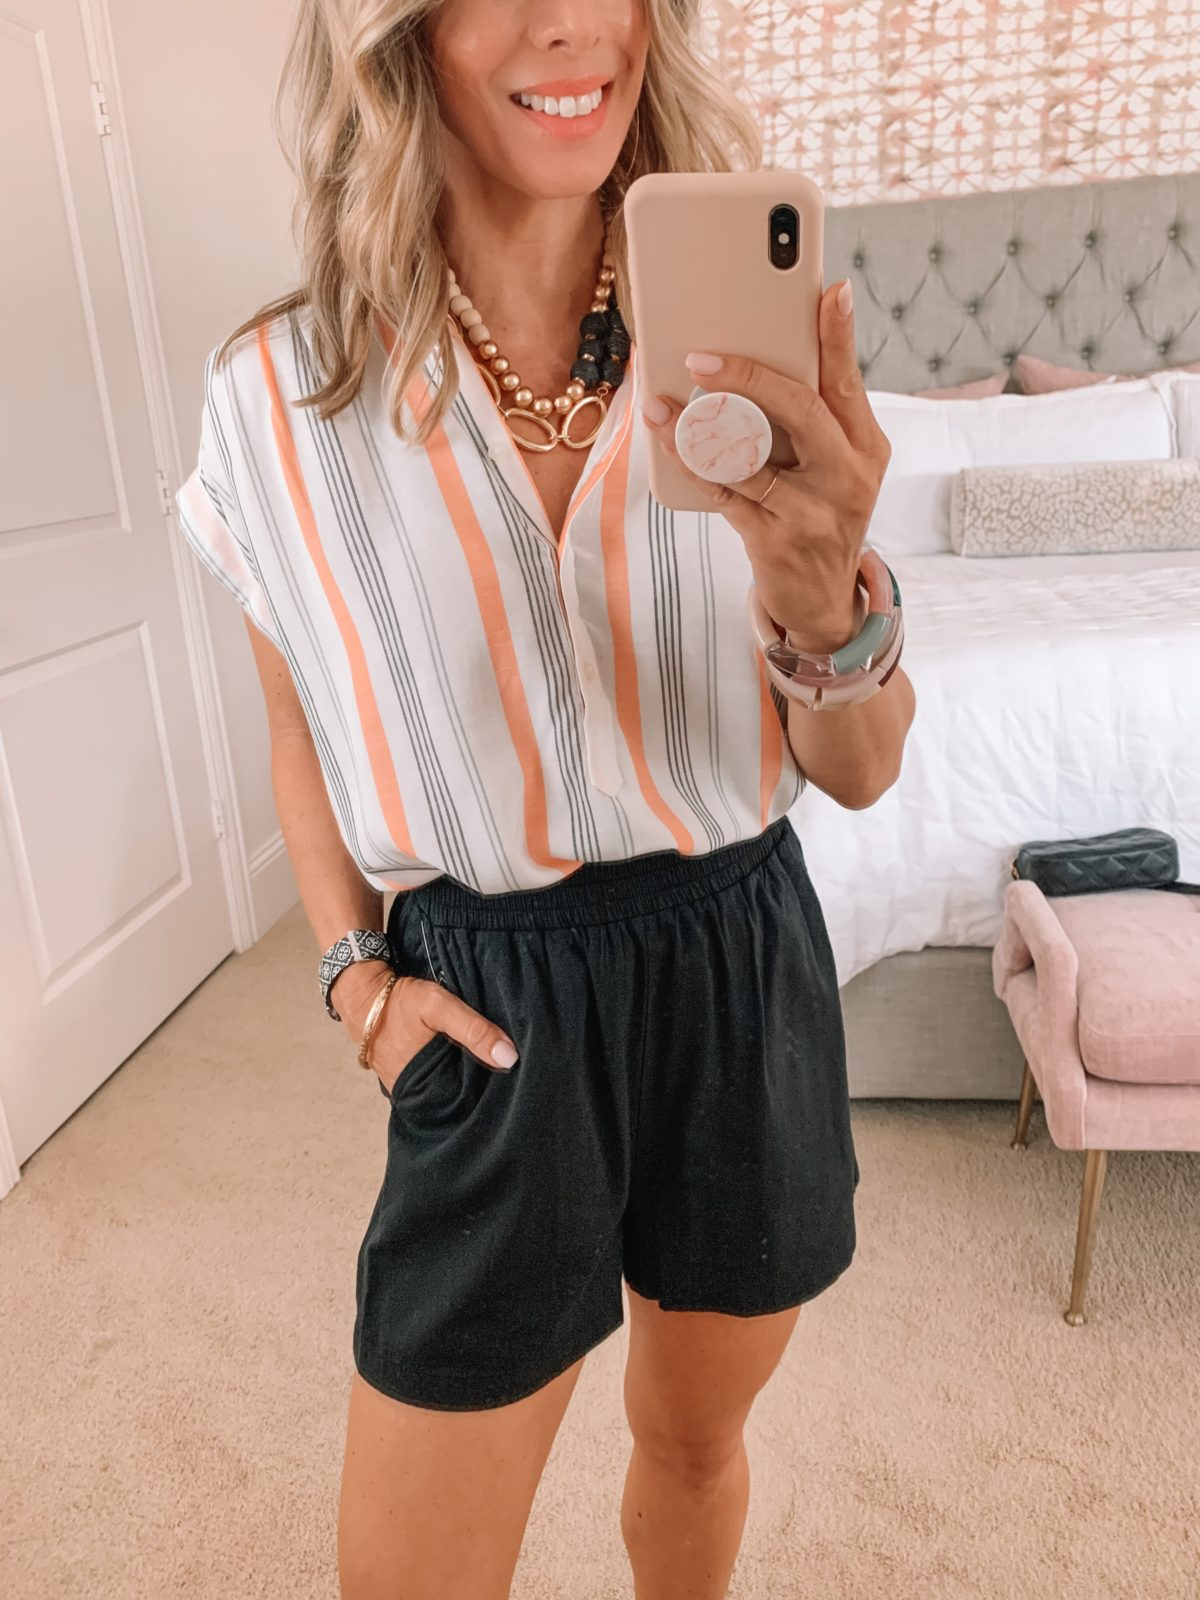 Dressing Room Finds, Stripe Top , Black Knit shorts, Sandals, Tote